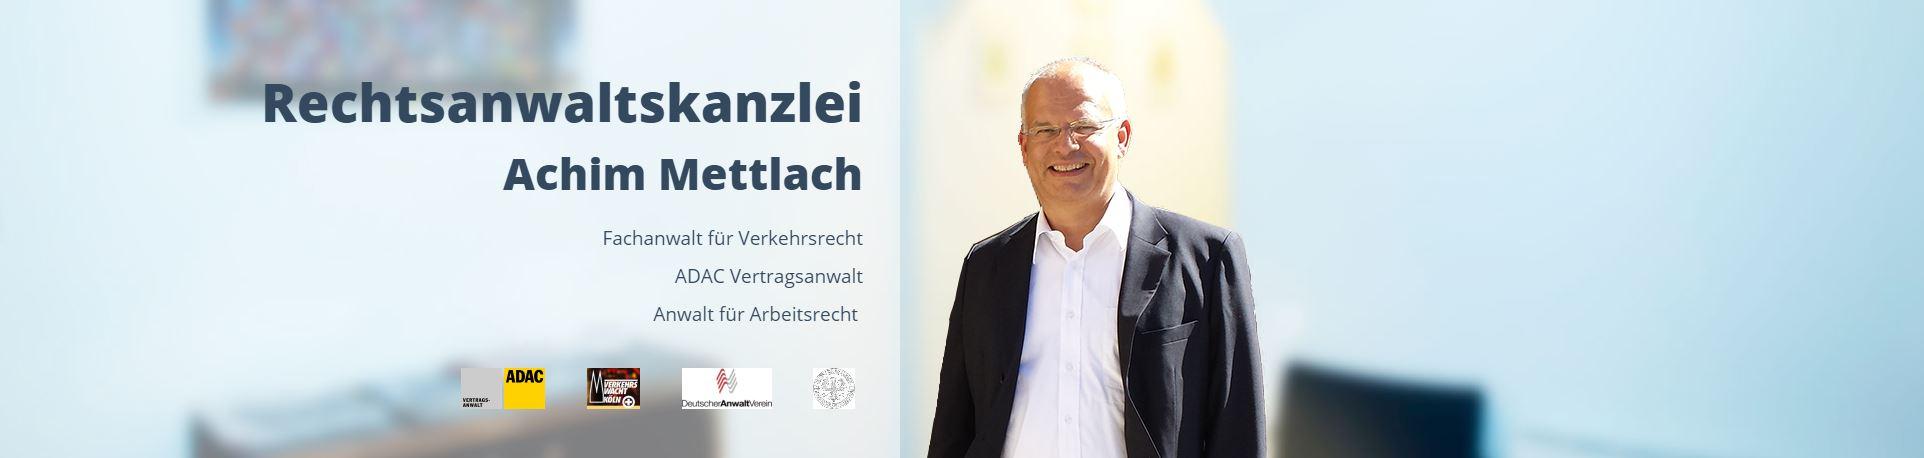 Rechtsanwaltskanzlei Mettlach in Köln